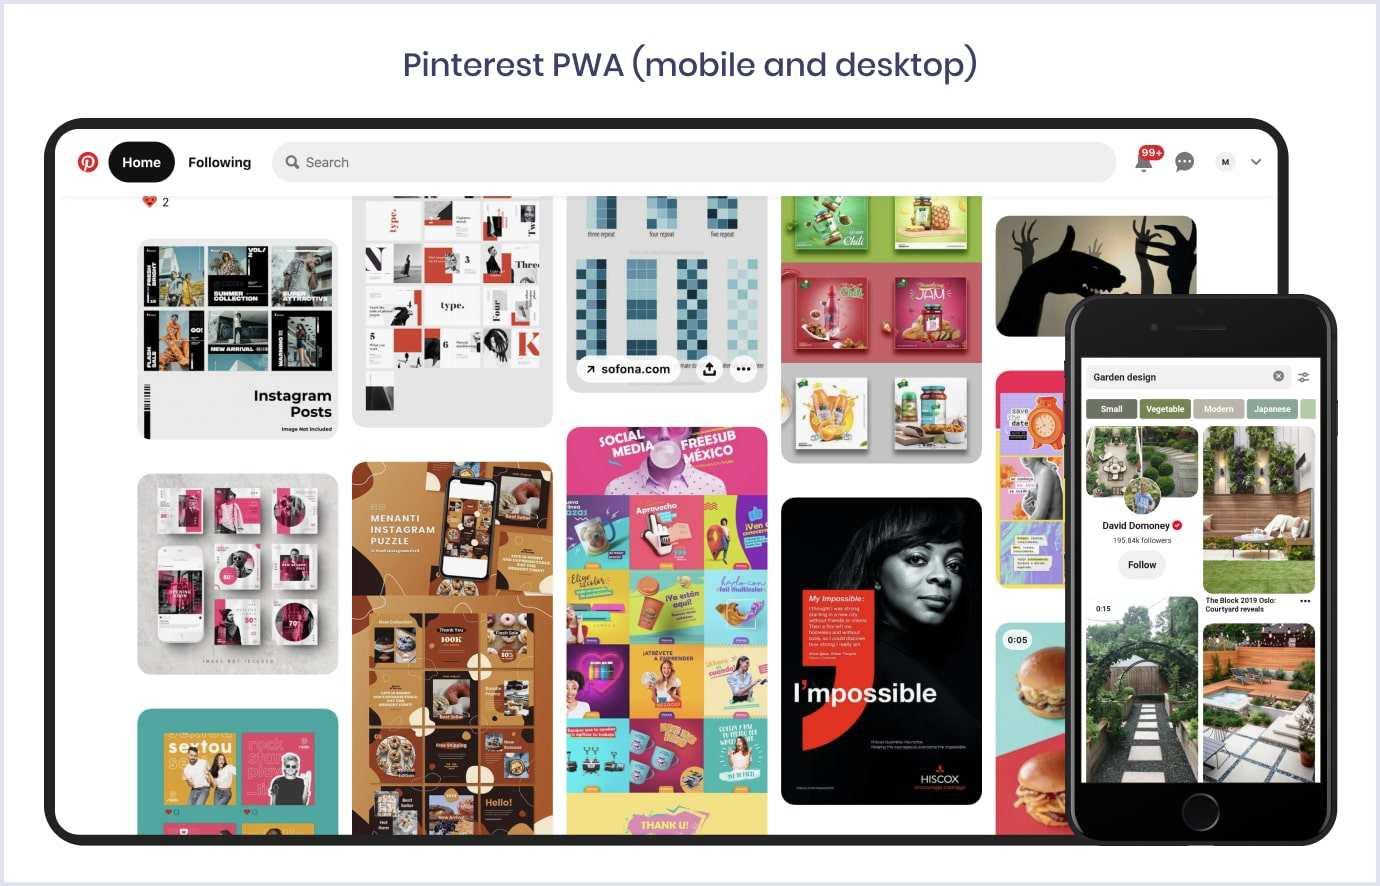 Pinterest PWA website